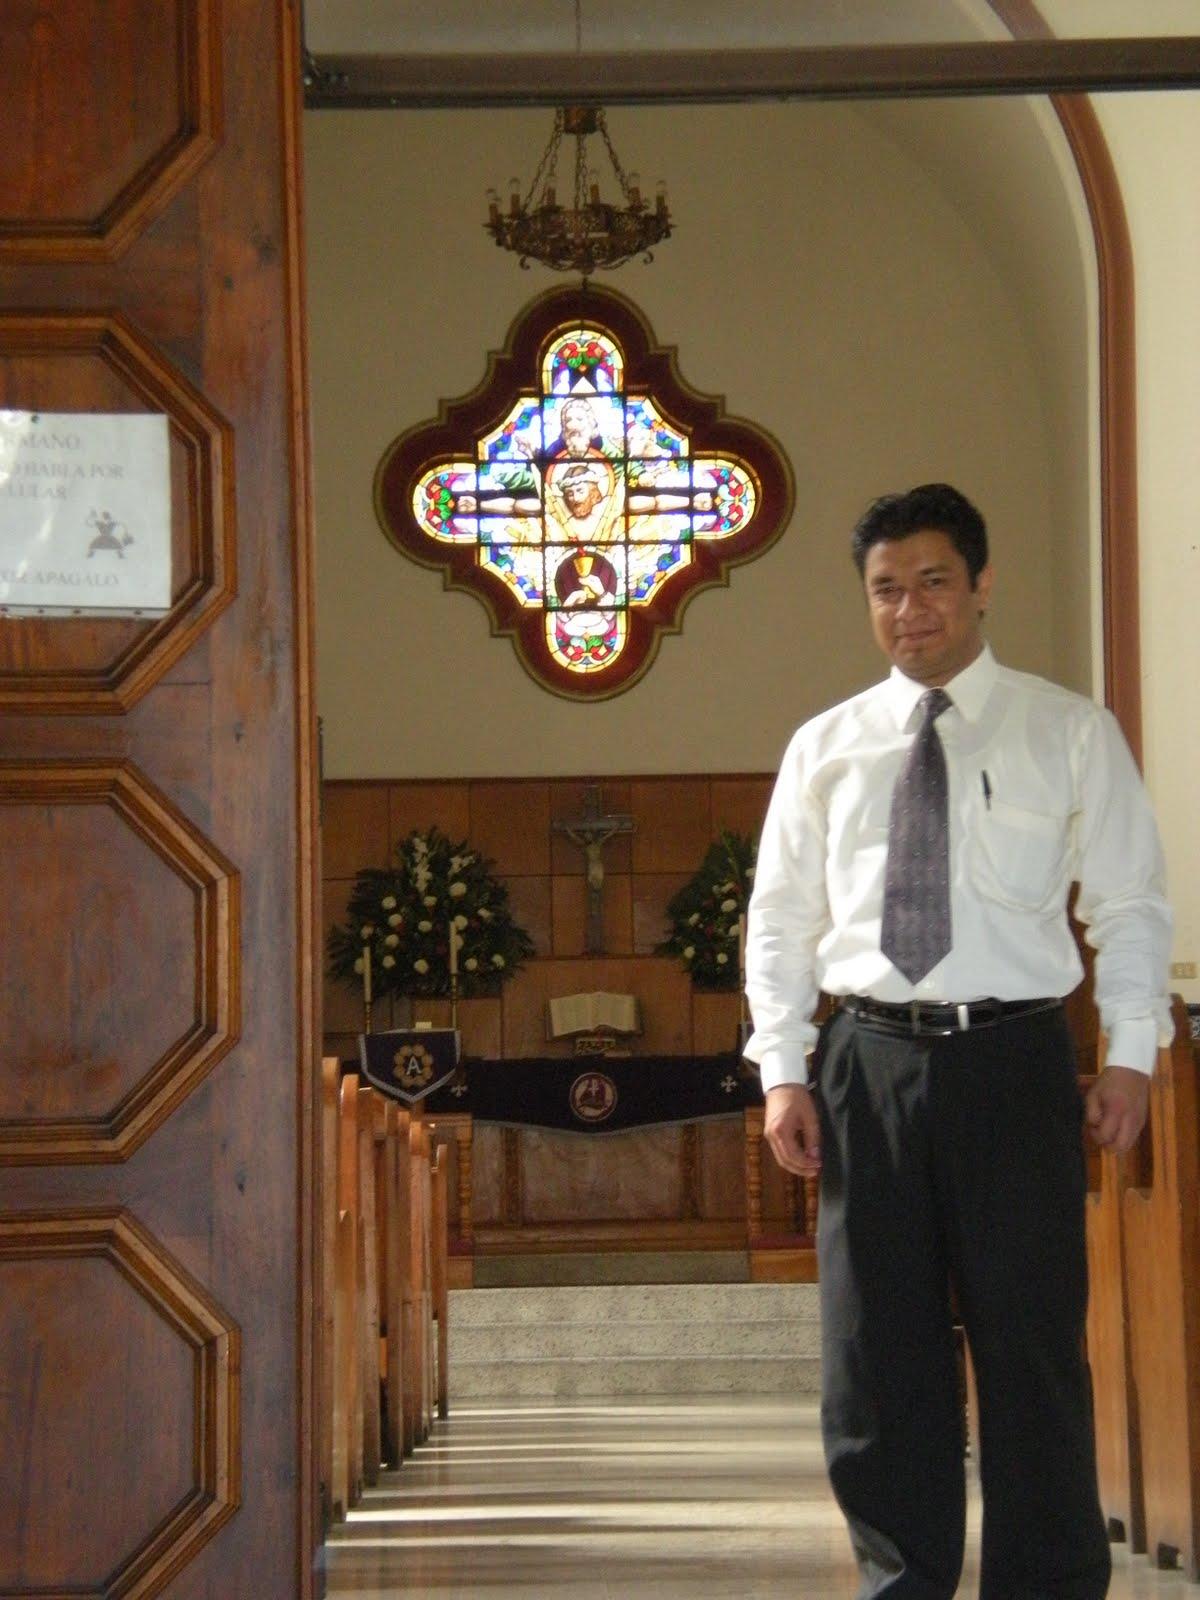 http://1.bp.blogspot.com/-OocQr_DBRng/Tftpnwe4a3I/AAAAAAAADNE/nWIjD8KLjhM/s1600/DSCN0666.JPG